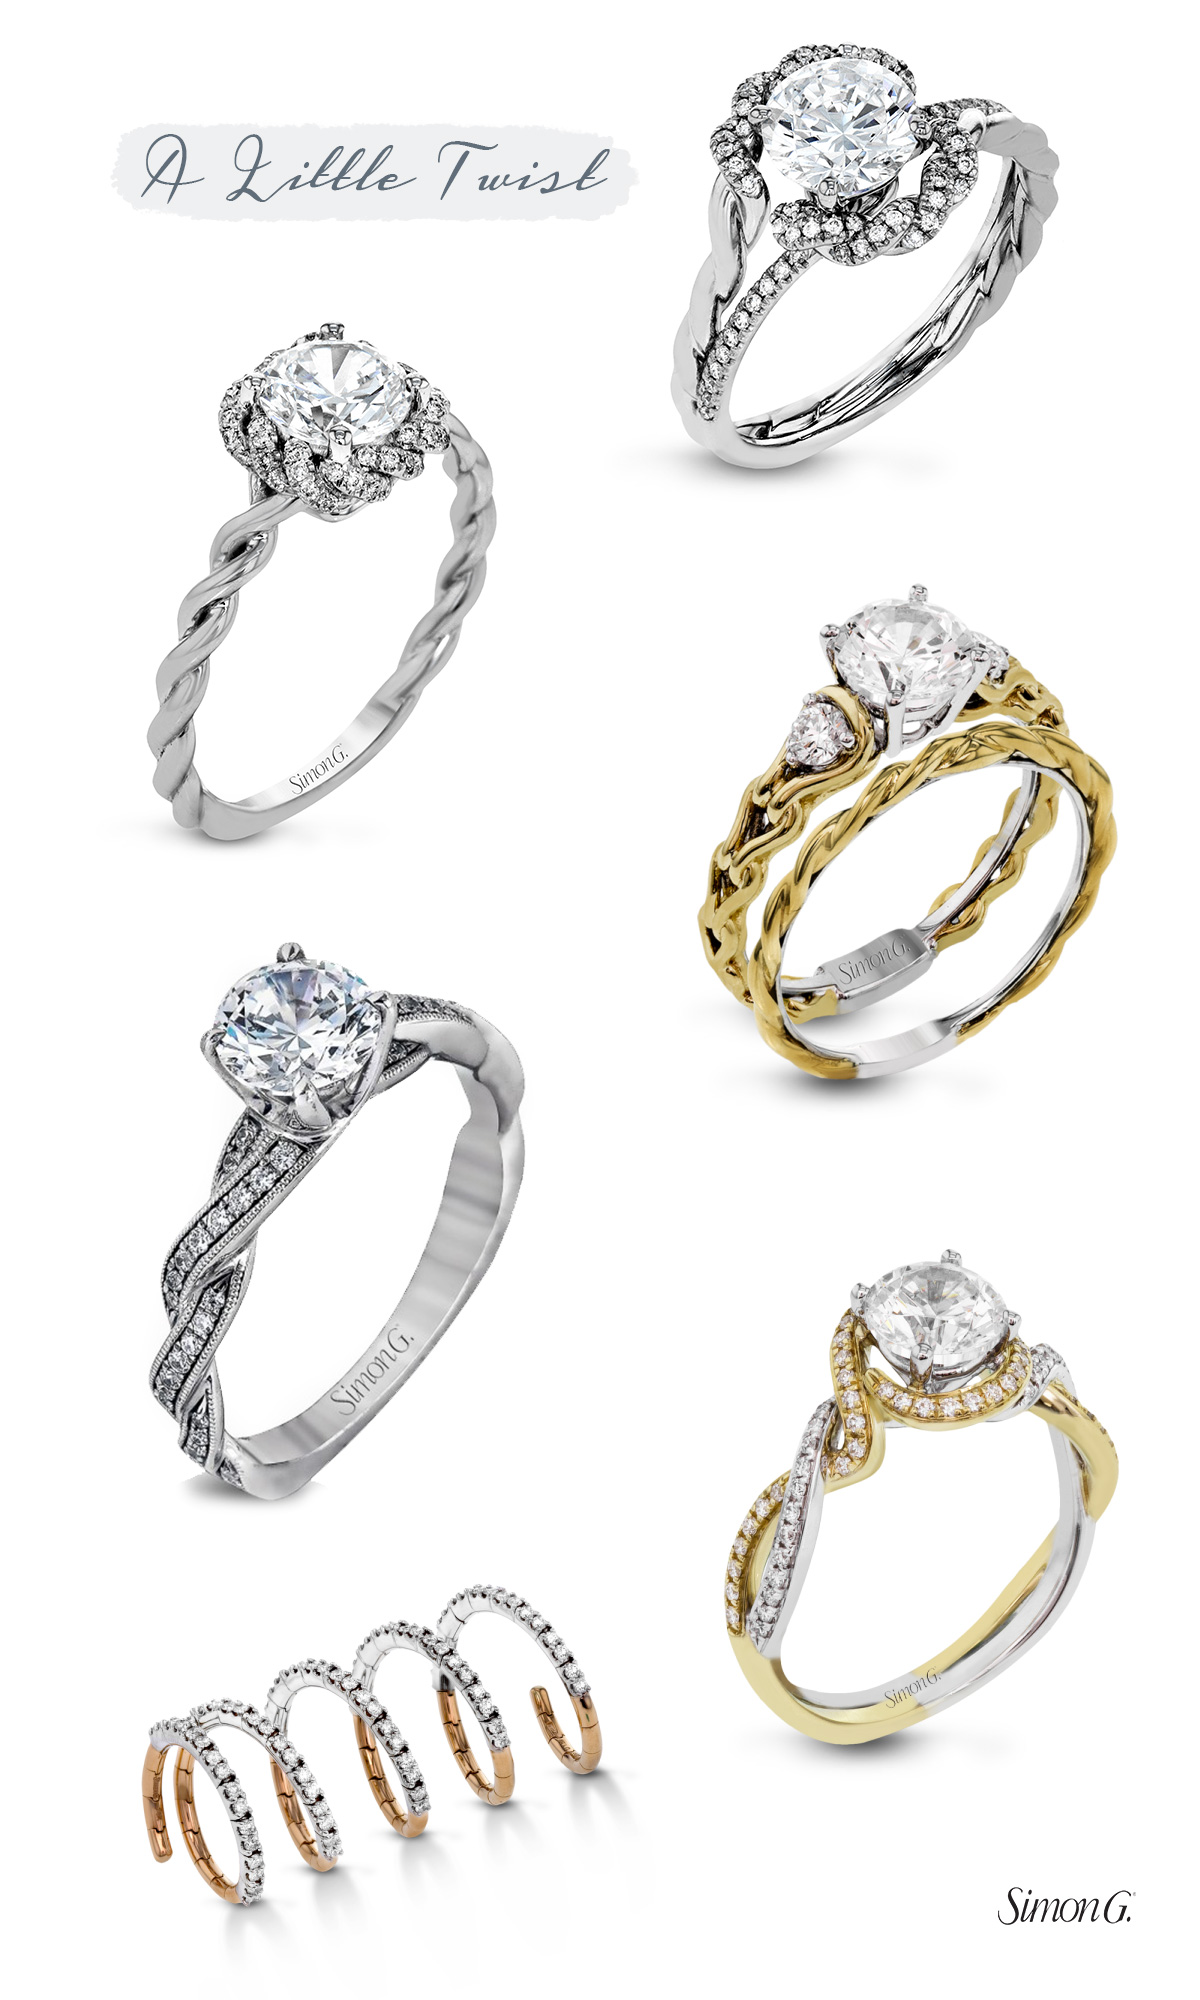 simon g jewelry 2017 trends engagement rings twist shank halo diamond ring